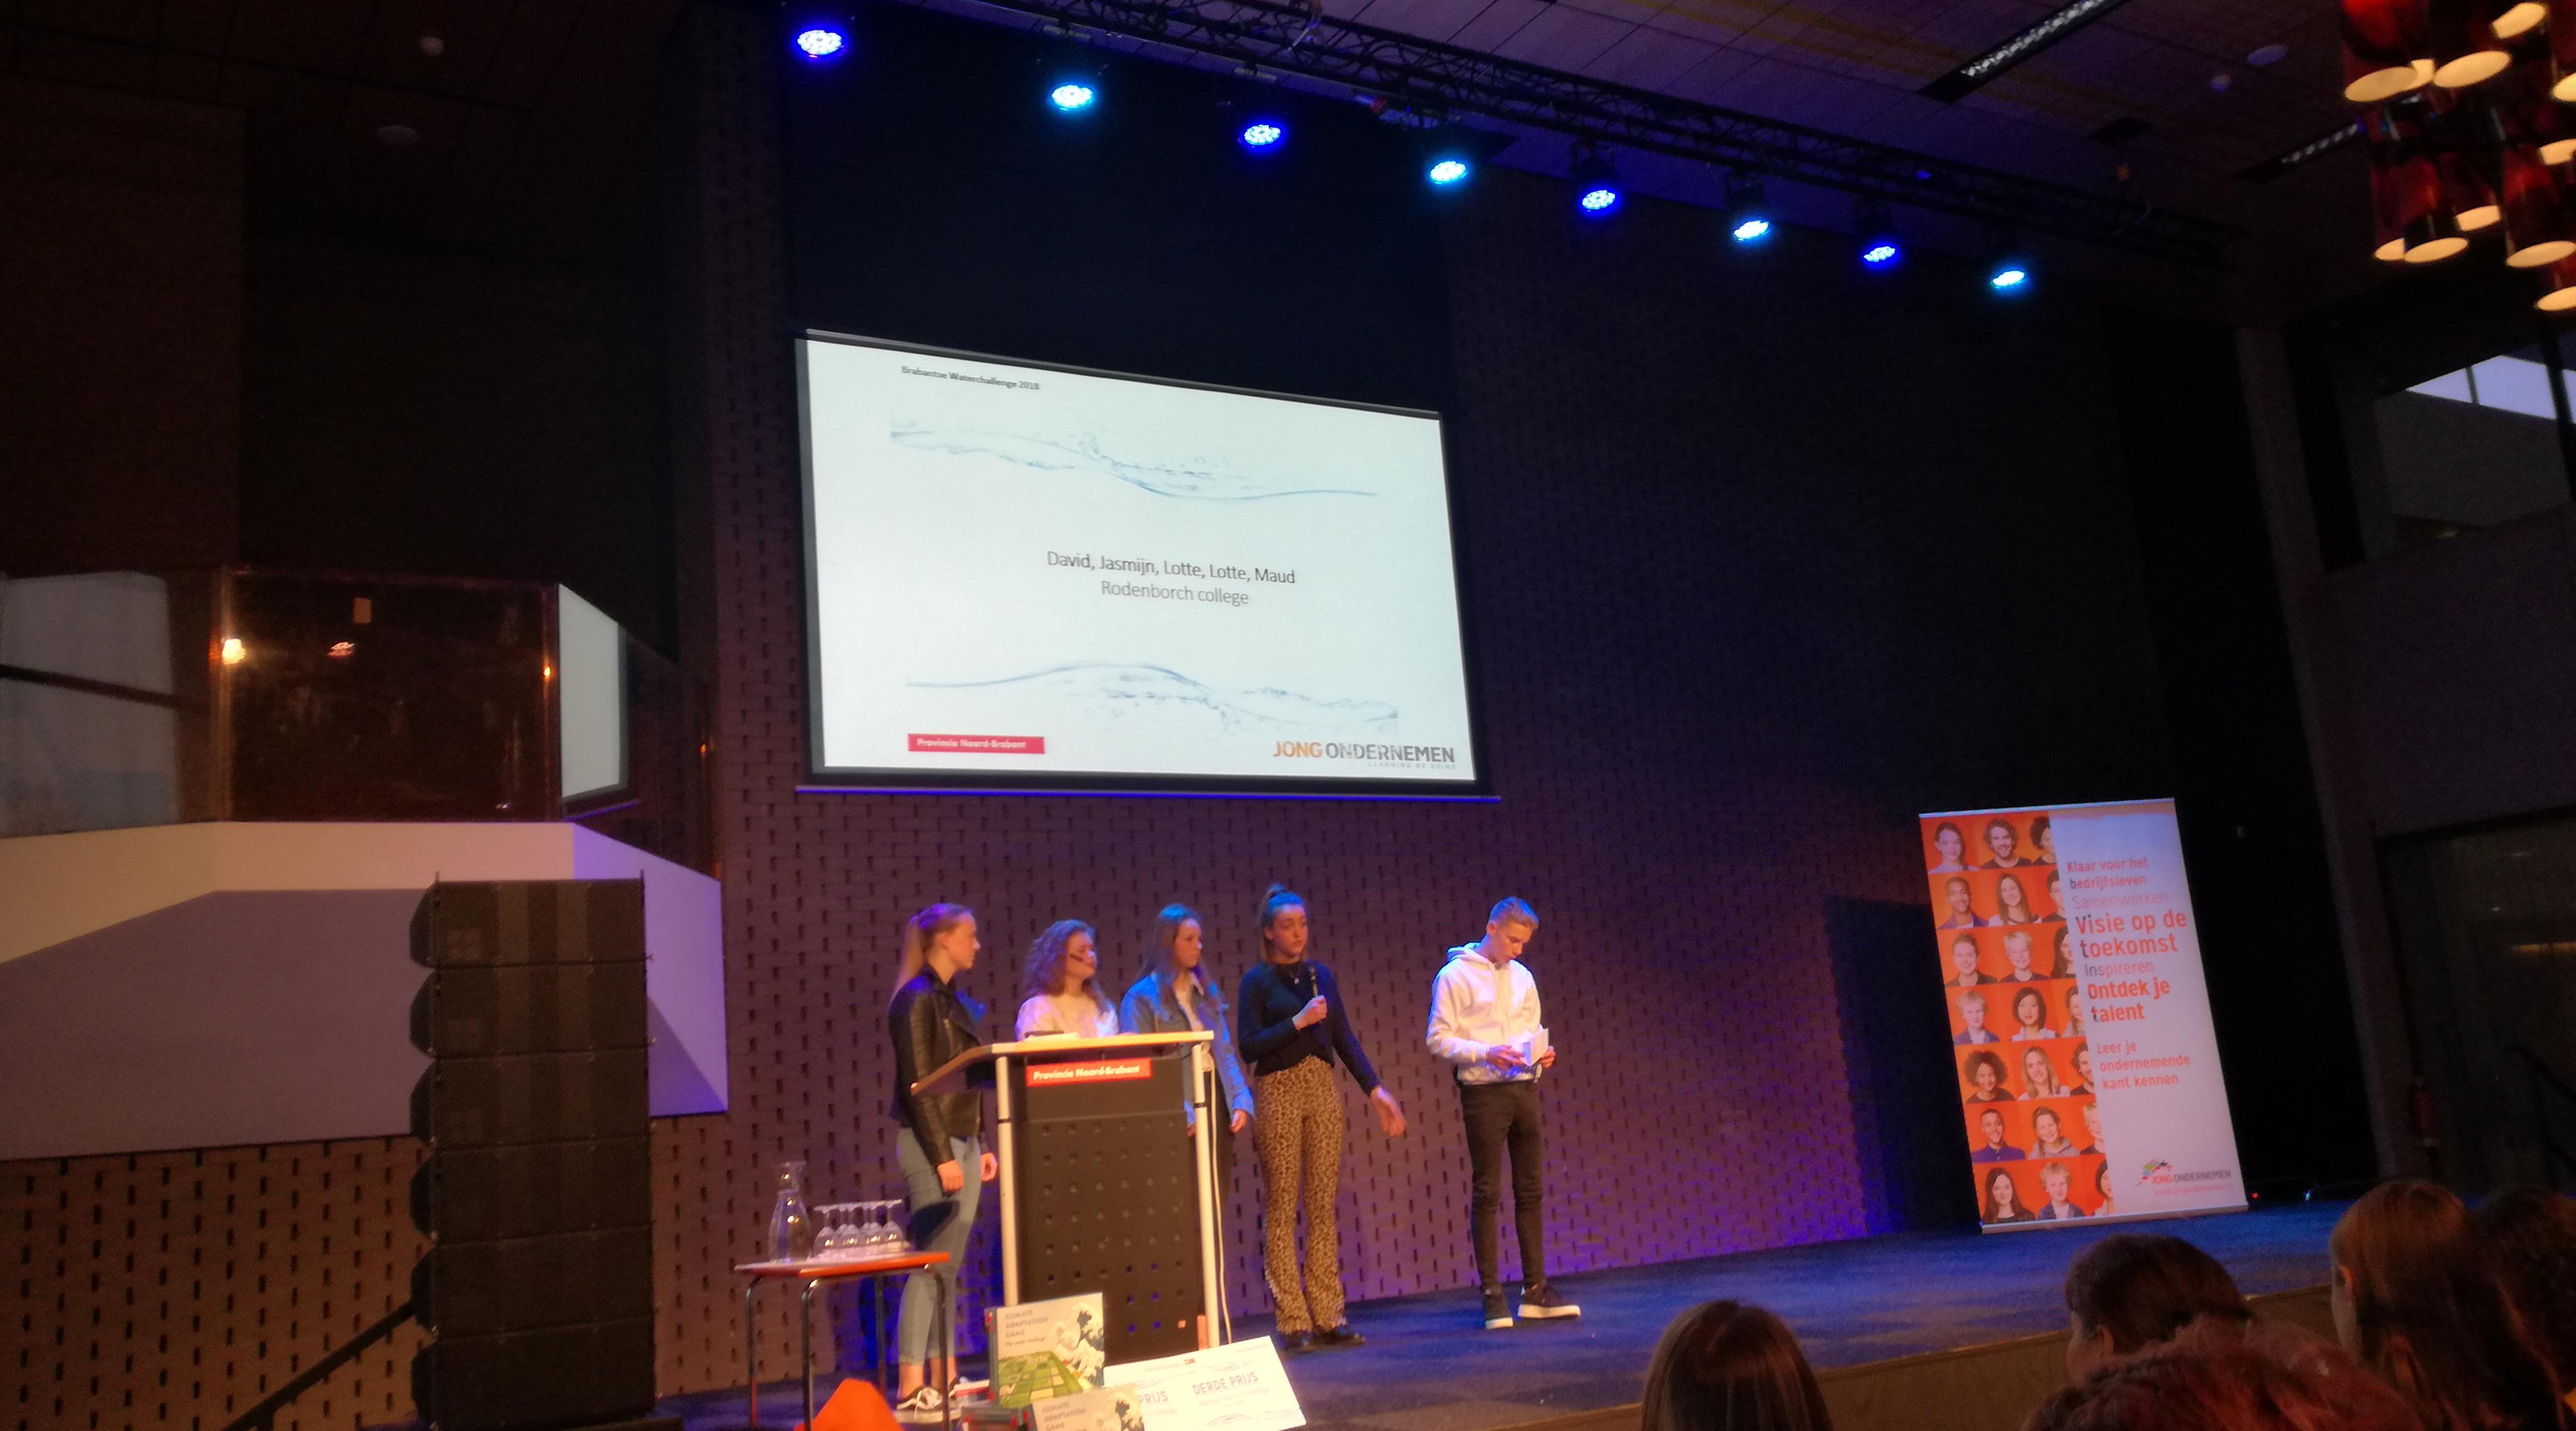 Jippe, Sophie, Tom en Puck winnen de Brabant Water Challenge 2018